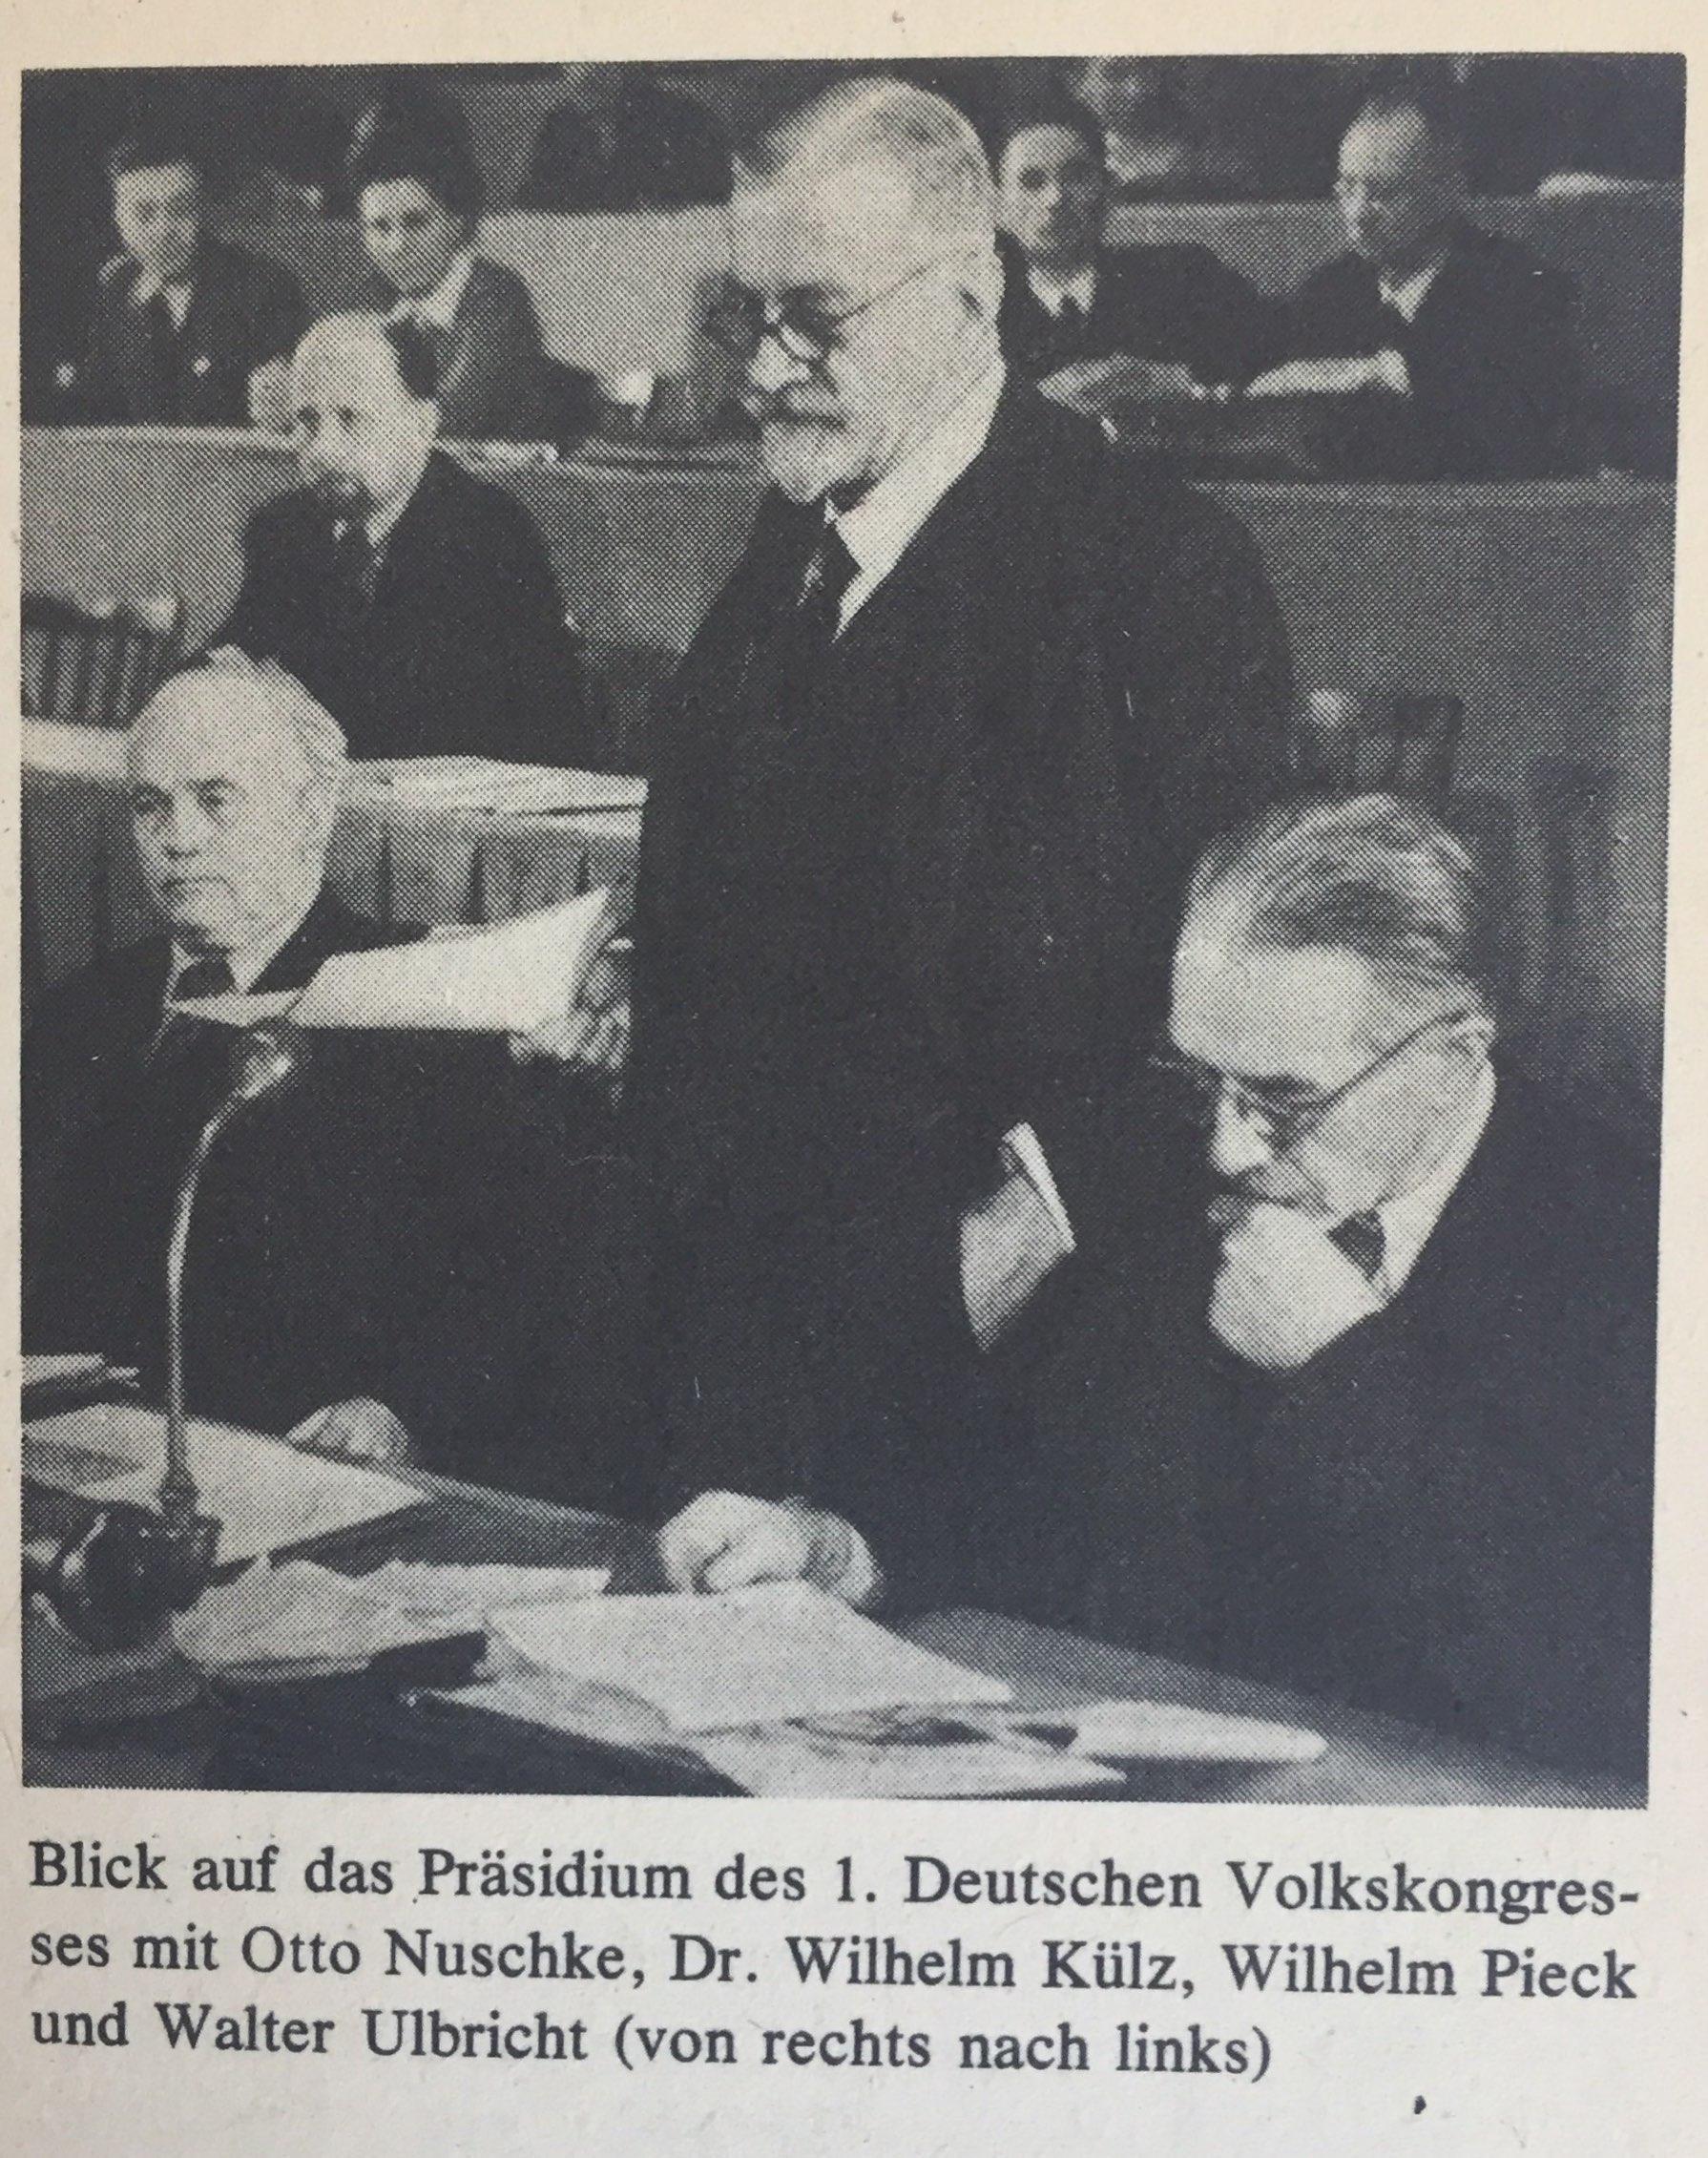 Präsidium Deutscher Volkskongress